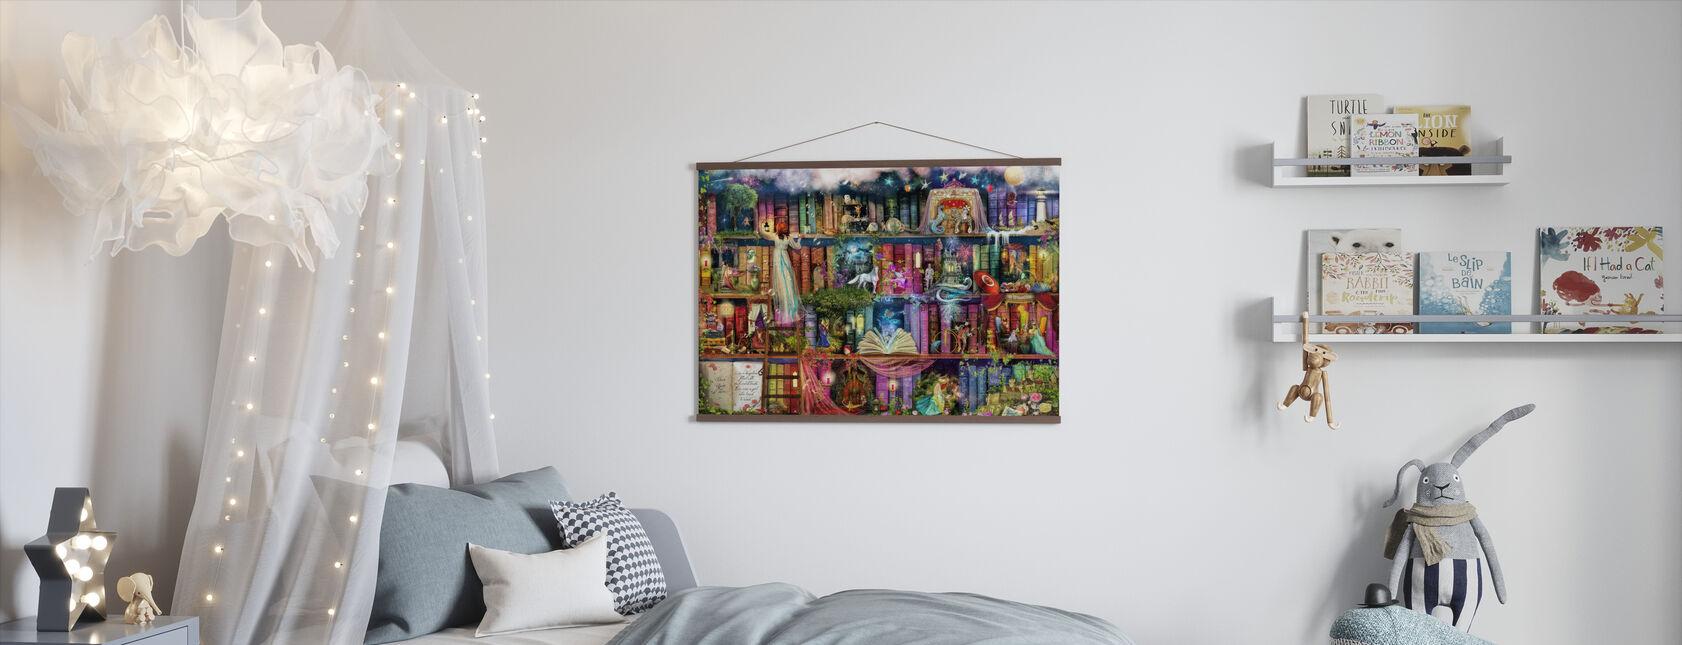 Schattenjacht boek plank - Poster - Kinderkamer